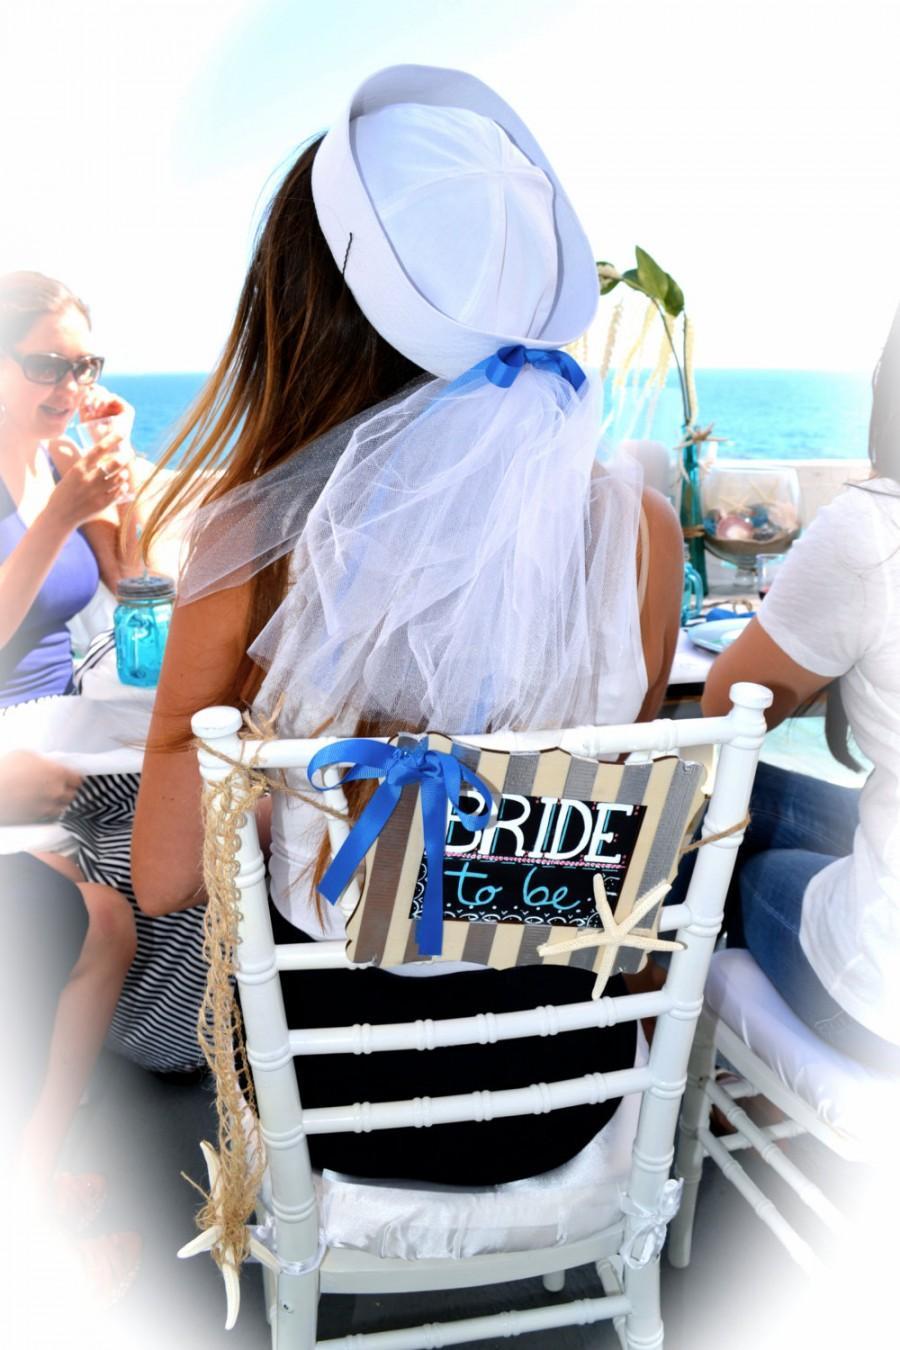 27d28b21c08 Nautical Bride Sailor hat with veil. Perfect for a nautical bridal shower  or bachelorette party